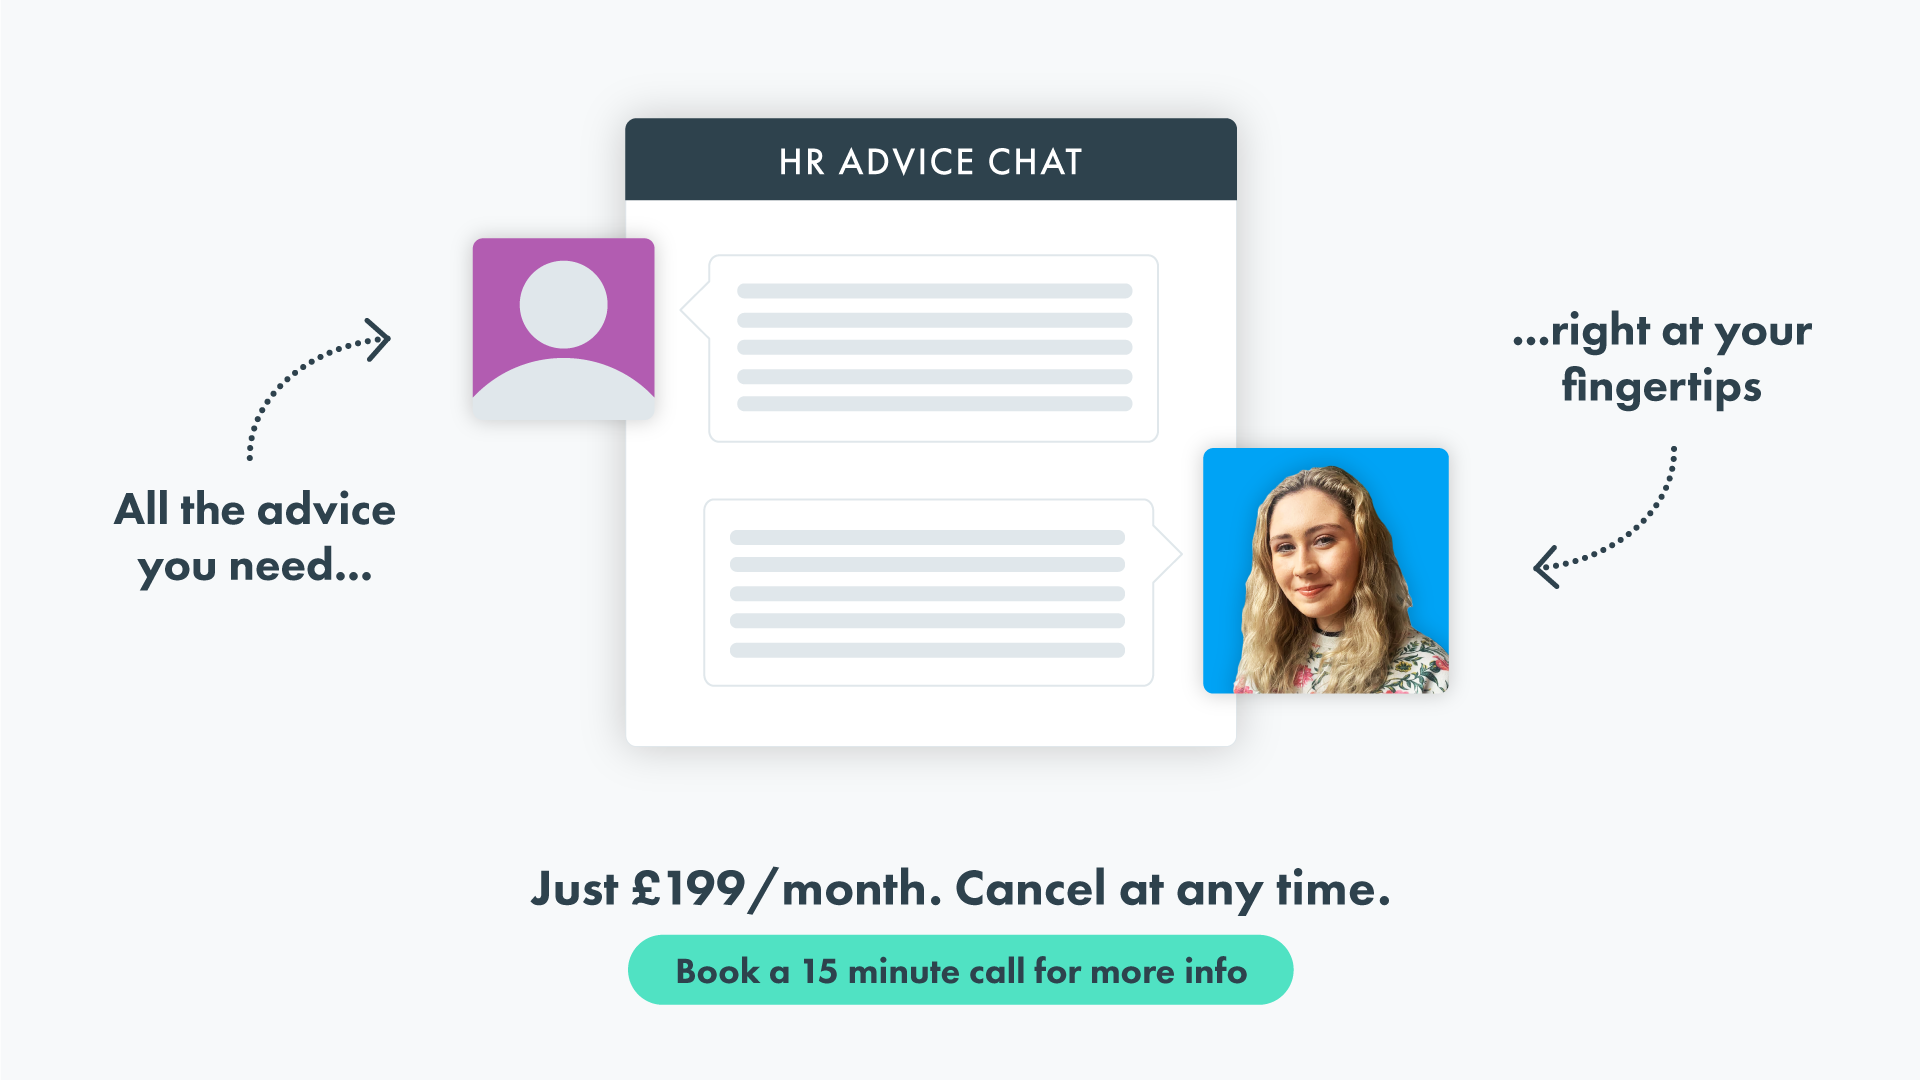 HR-Advice-chat_1